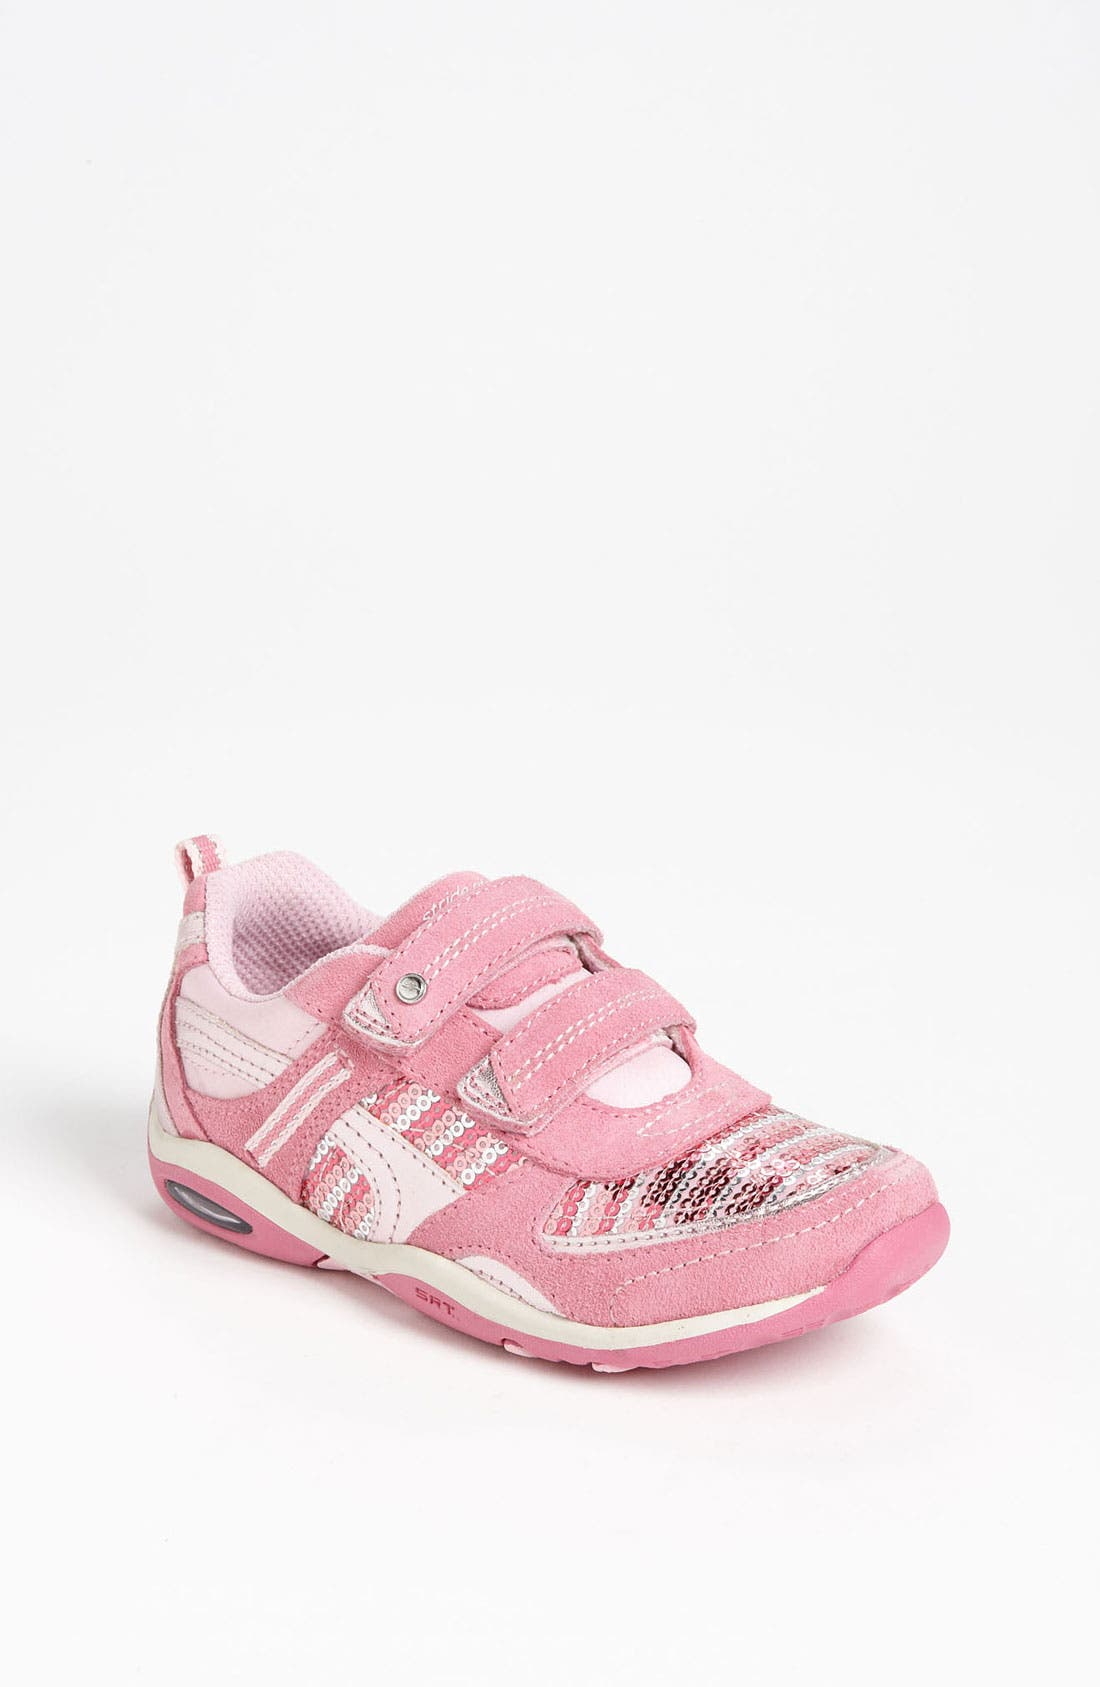 Alternate Image 1 Selected - Stride Rite 'Maxi' Sneaker (Toddler & Little Kid)